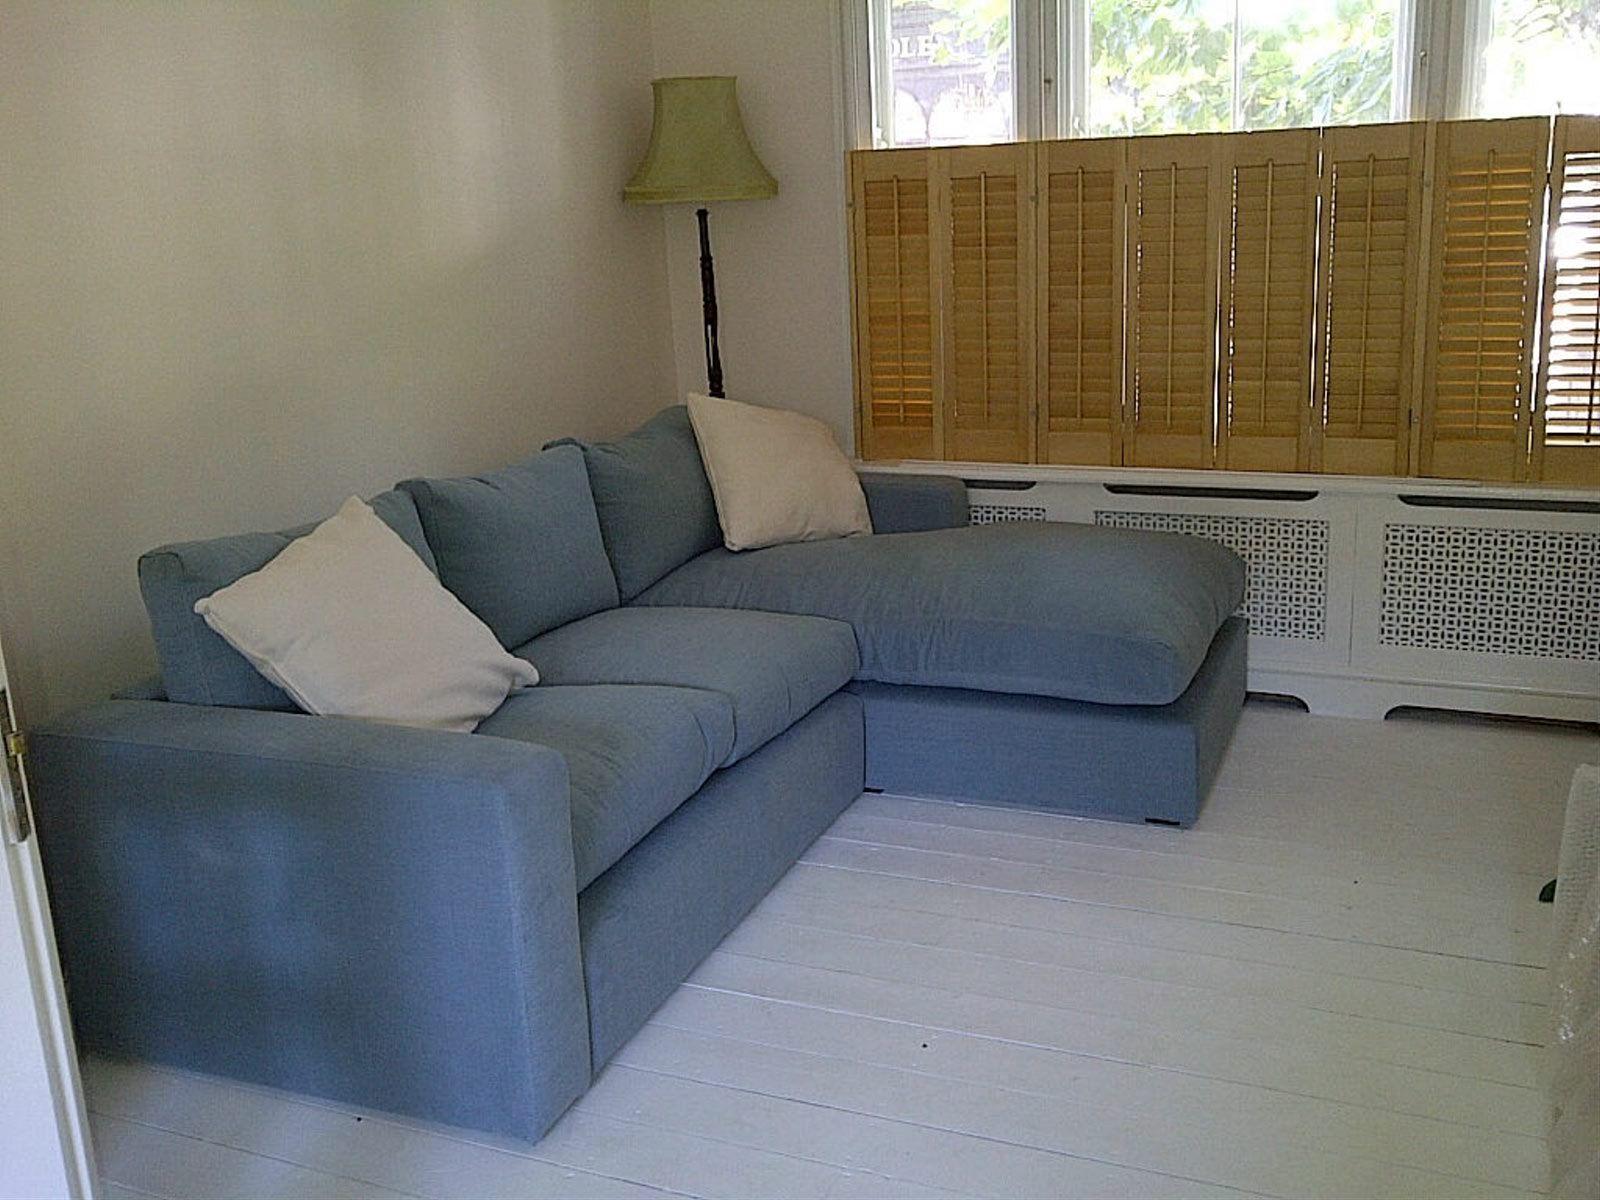 Stella Chaise In Brushed Linen Cotton Lagoon Http Www Sofa Com Shop Sofas Stella Corner 312 Blclag 0 0 Sofa Colors Corner Sofa Sofa